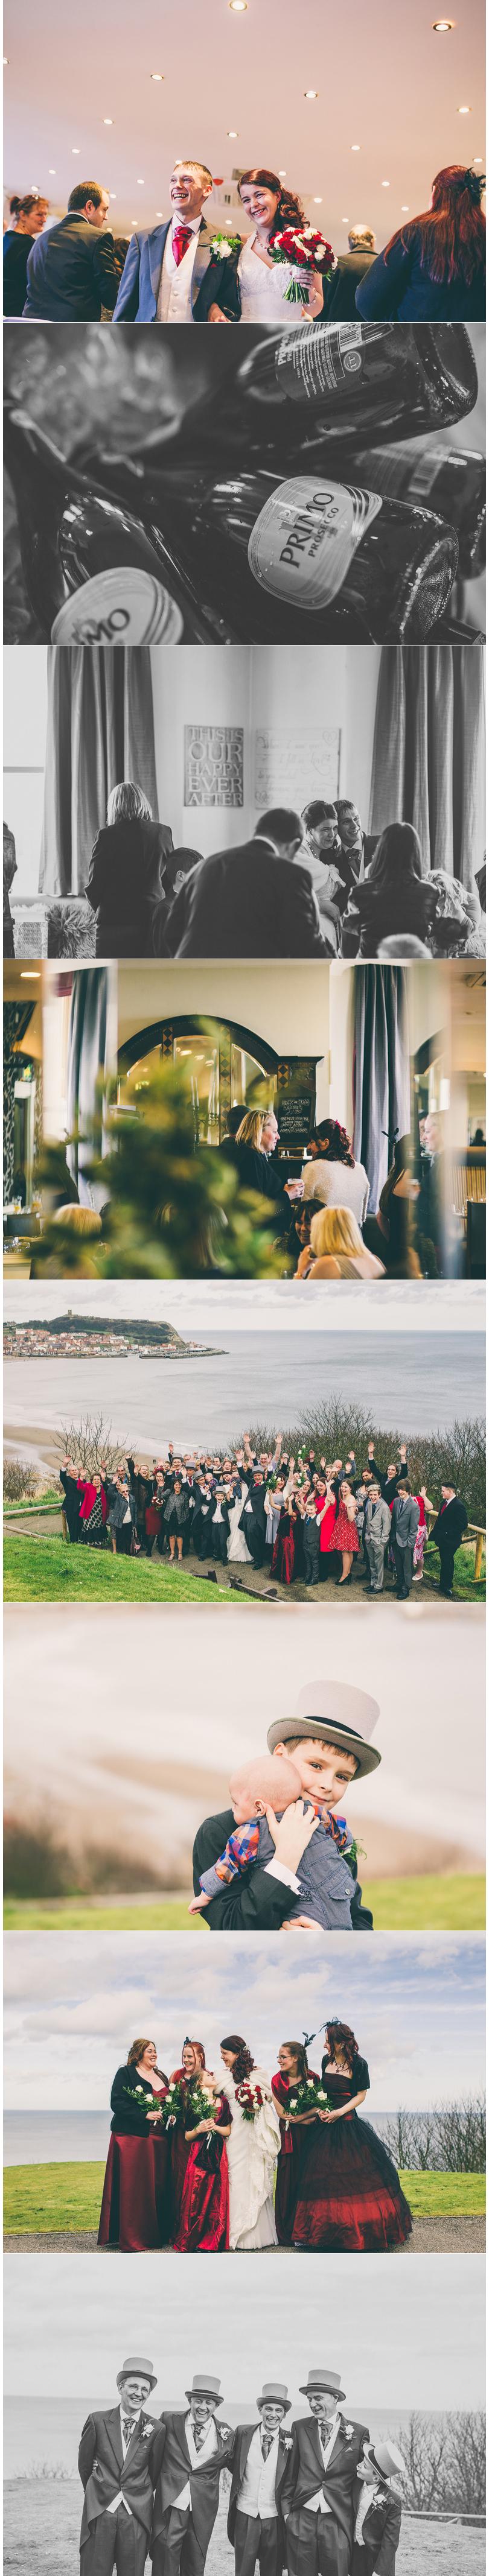 Neil_Jackson_Photographic_Scarborough_York_Yorkshire_Wedding_Photographer_Jo_Ash_Ambassador_Spa_Hotel_Scarborough_Wedding_Blog5